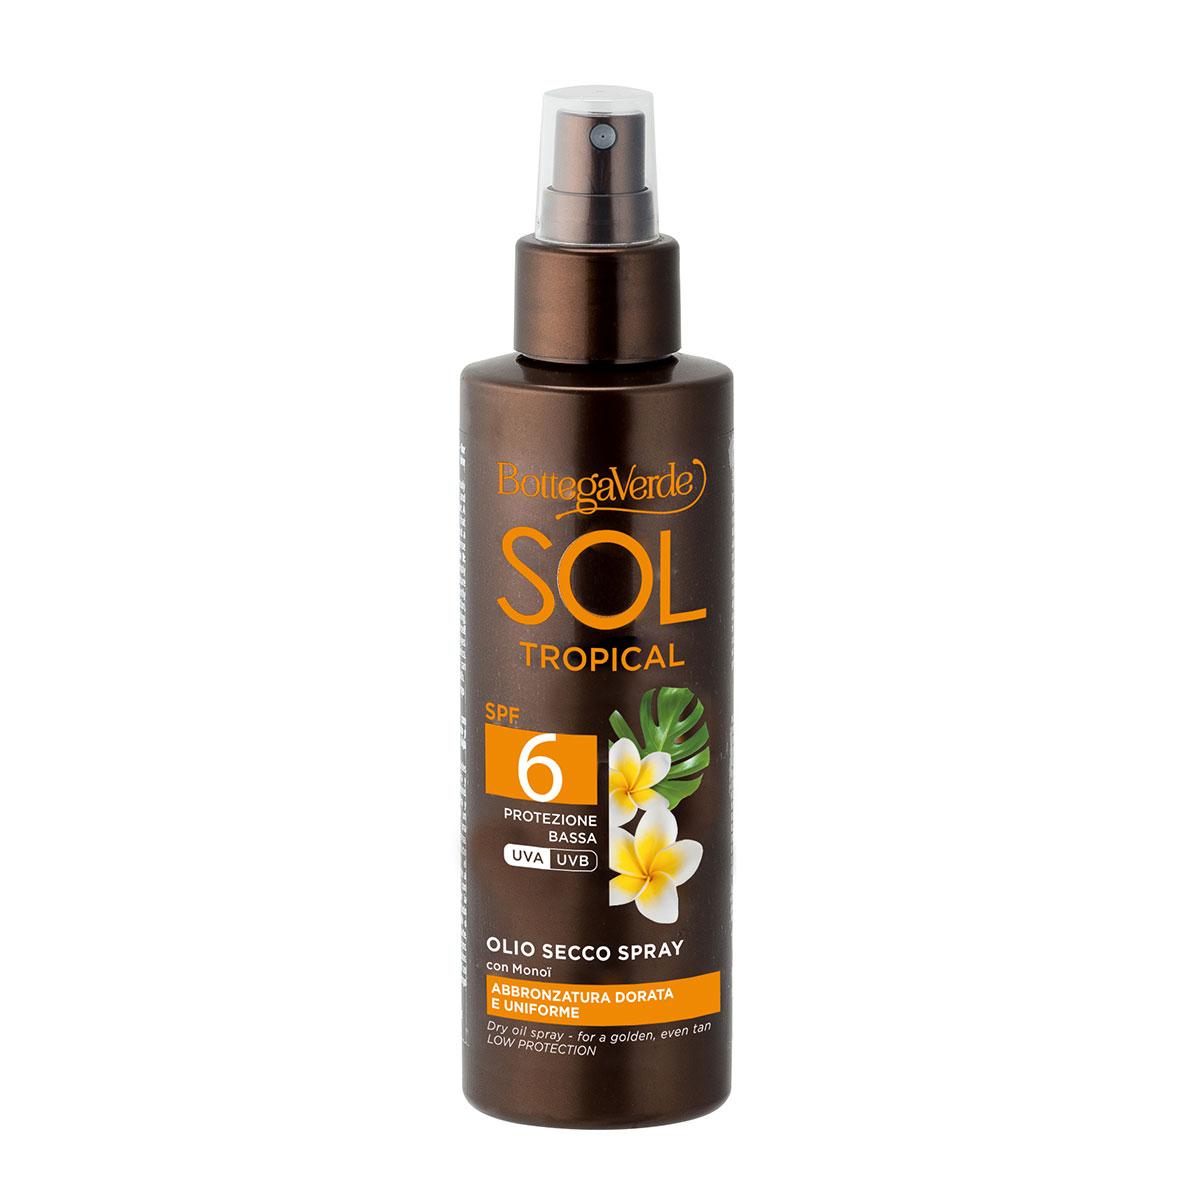 Ulei bronzant, cu ulei de Monoi, SPF 6 imagine